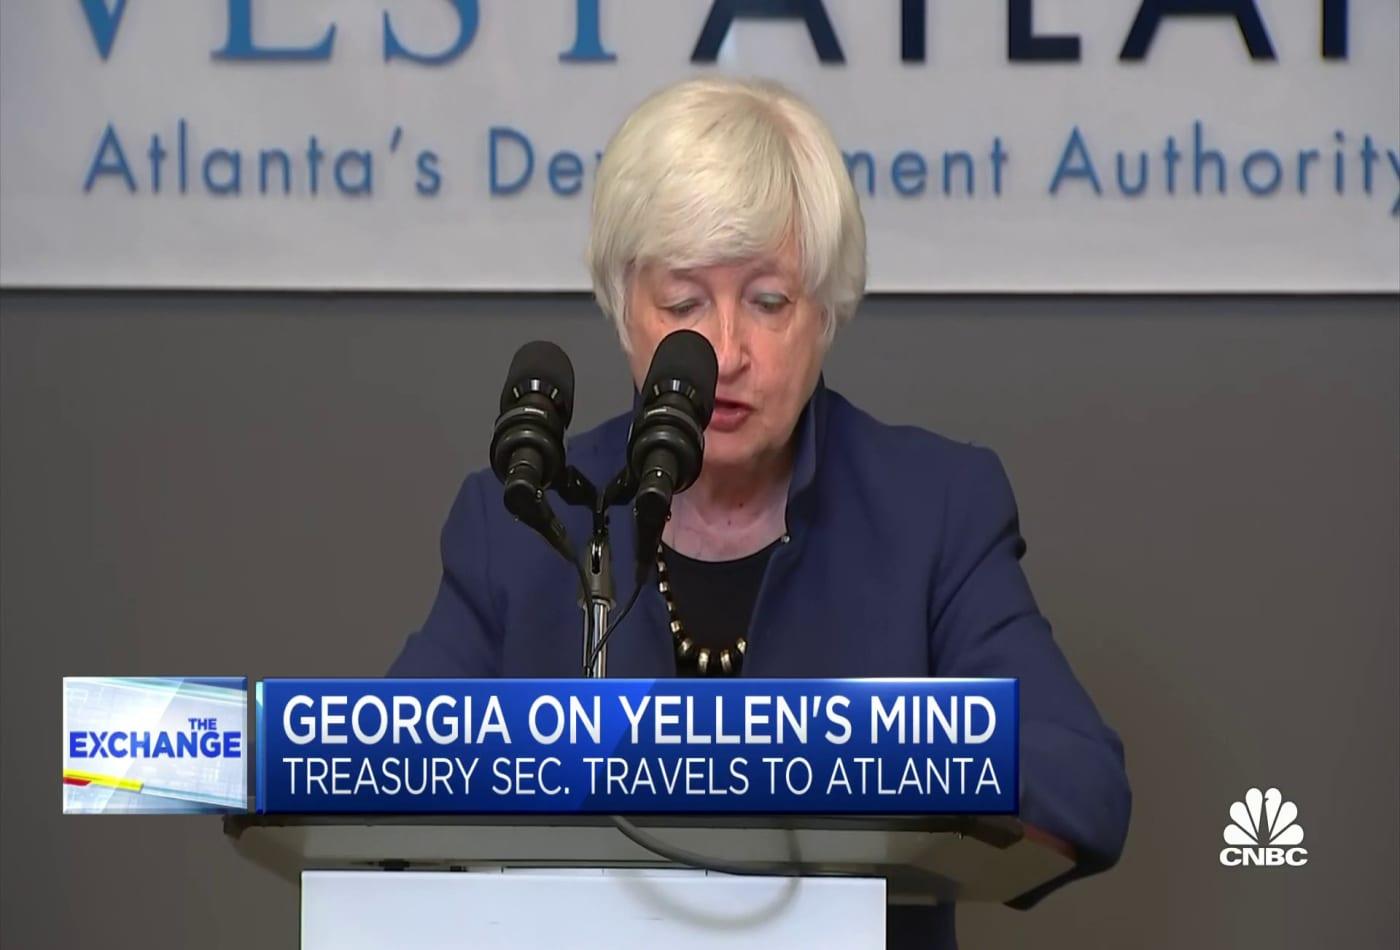 Treasury Sec. Yellen hits the road to promote White House economic agenda